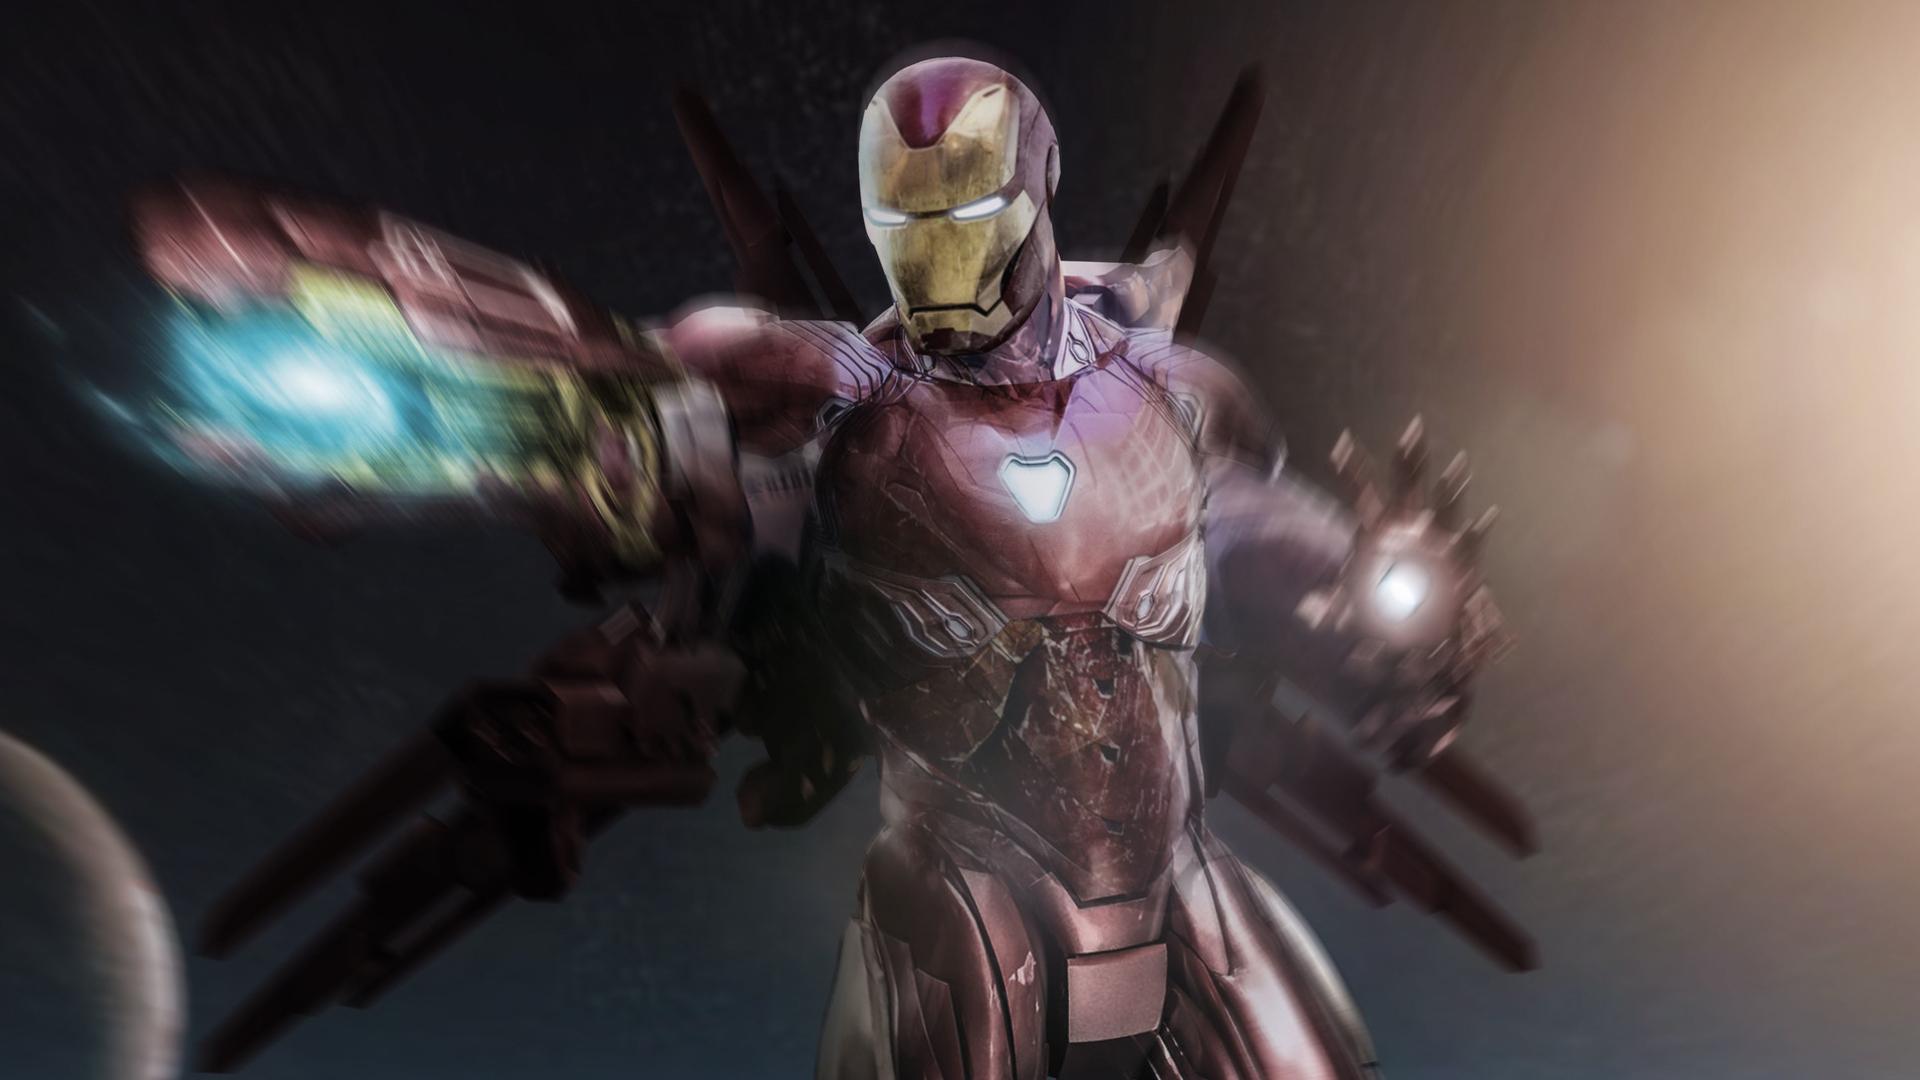 1920x1080 Iron Man Avengers Infinity War Suit Laptop Full Hd